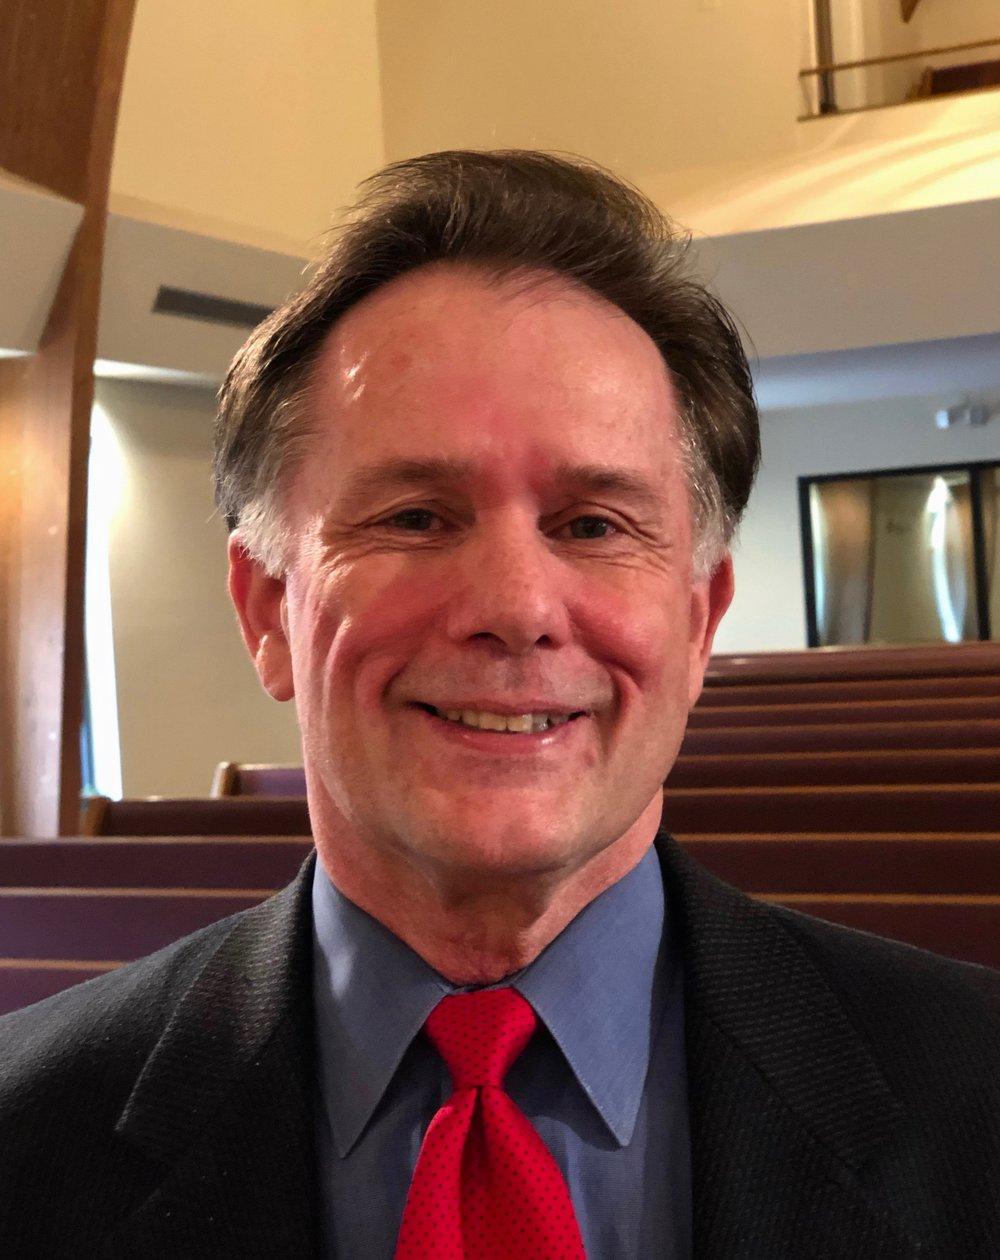 David Harrill - David Harrill has been serving as the interim teaching pastor for Genesis Bible Church since Sunday, October 7, 2018.